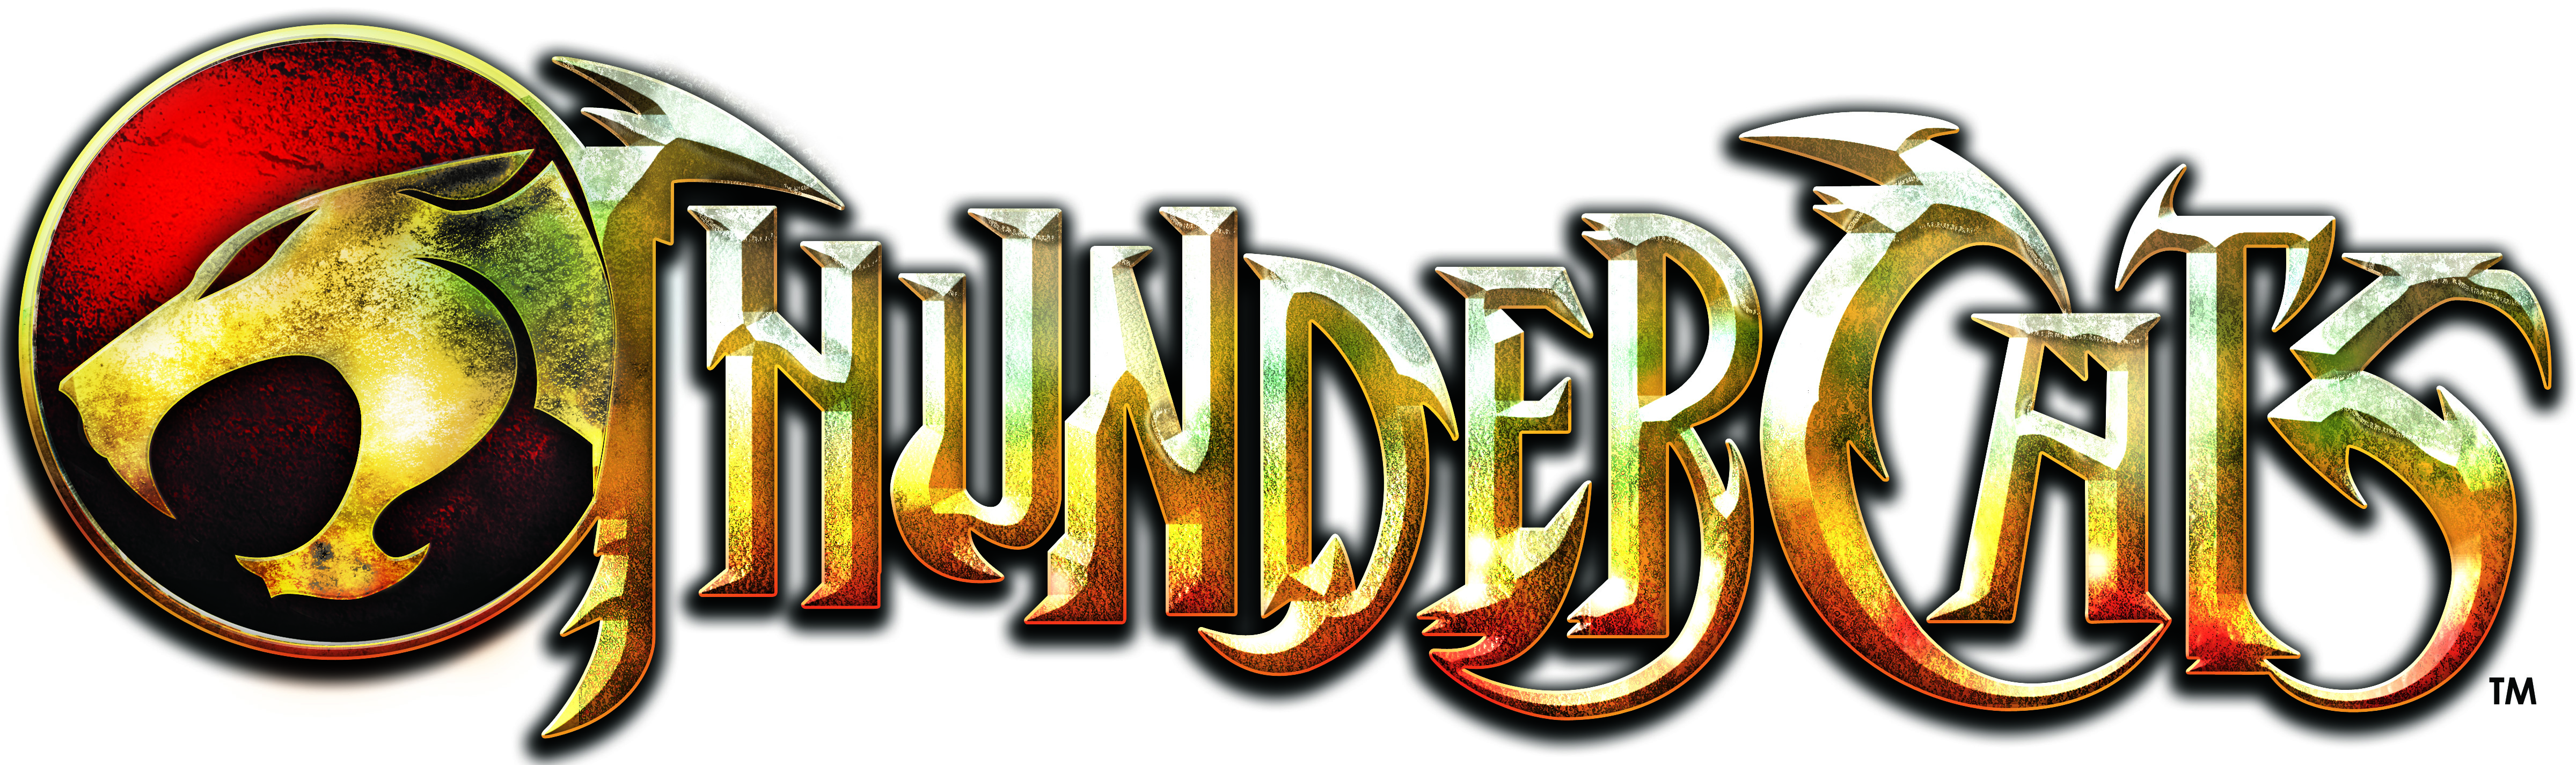 Thundercats Hd Wallpaper Background Image 4800x1425 Id511654